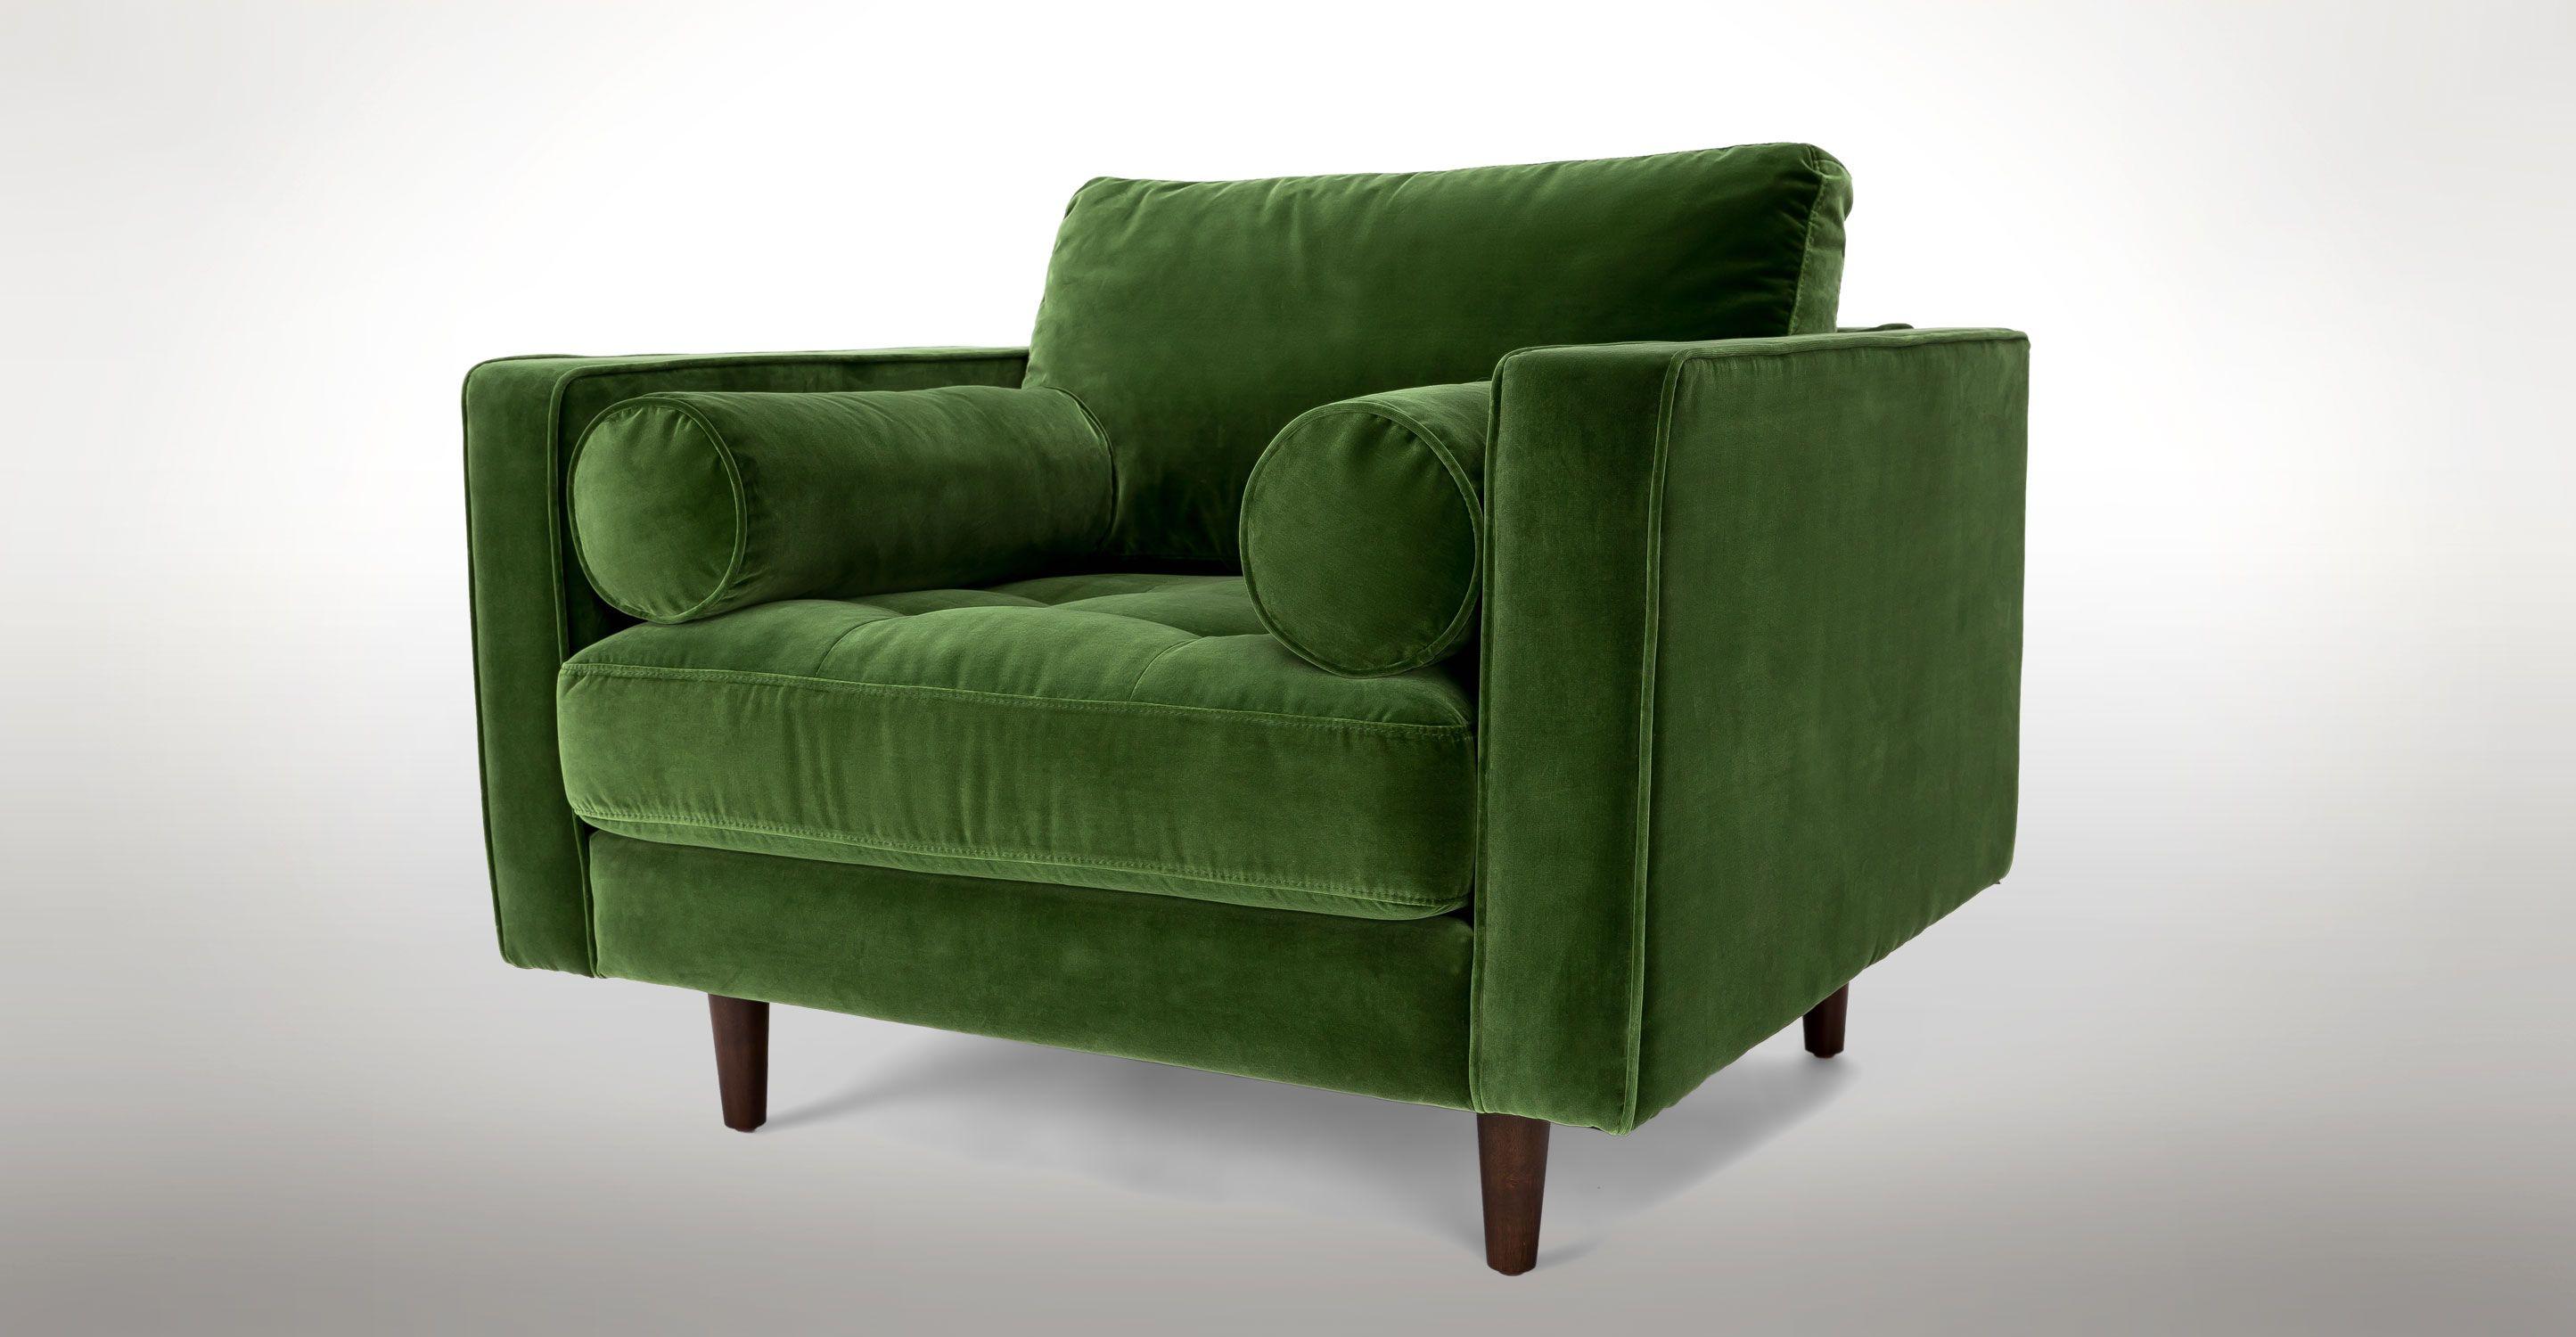 Strange Sven Grass Green Chair Furniture Living Room Furniture Dailytribune Chair Design For Home Dailytribuneorg